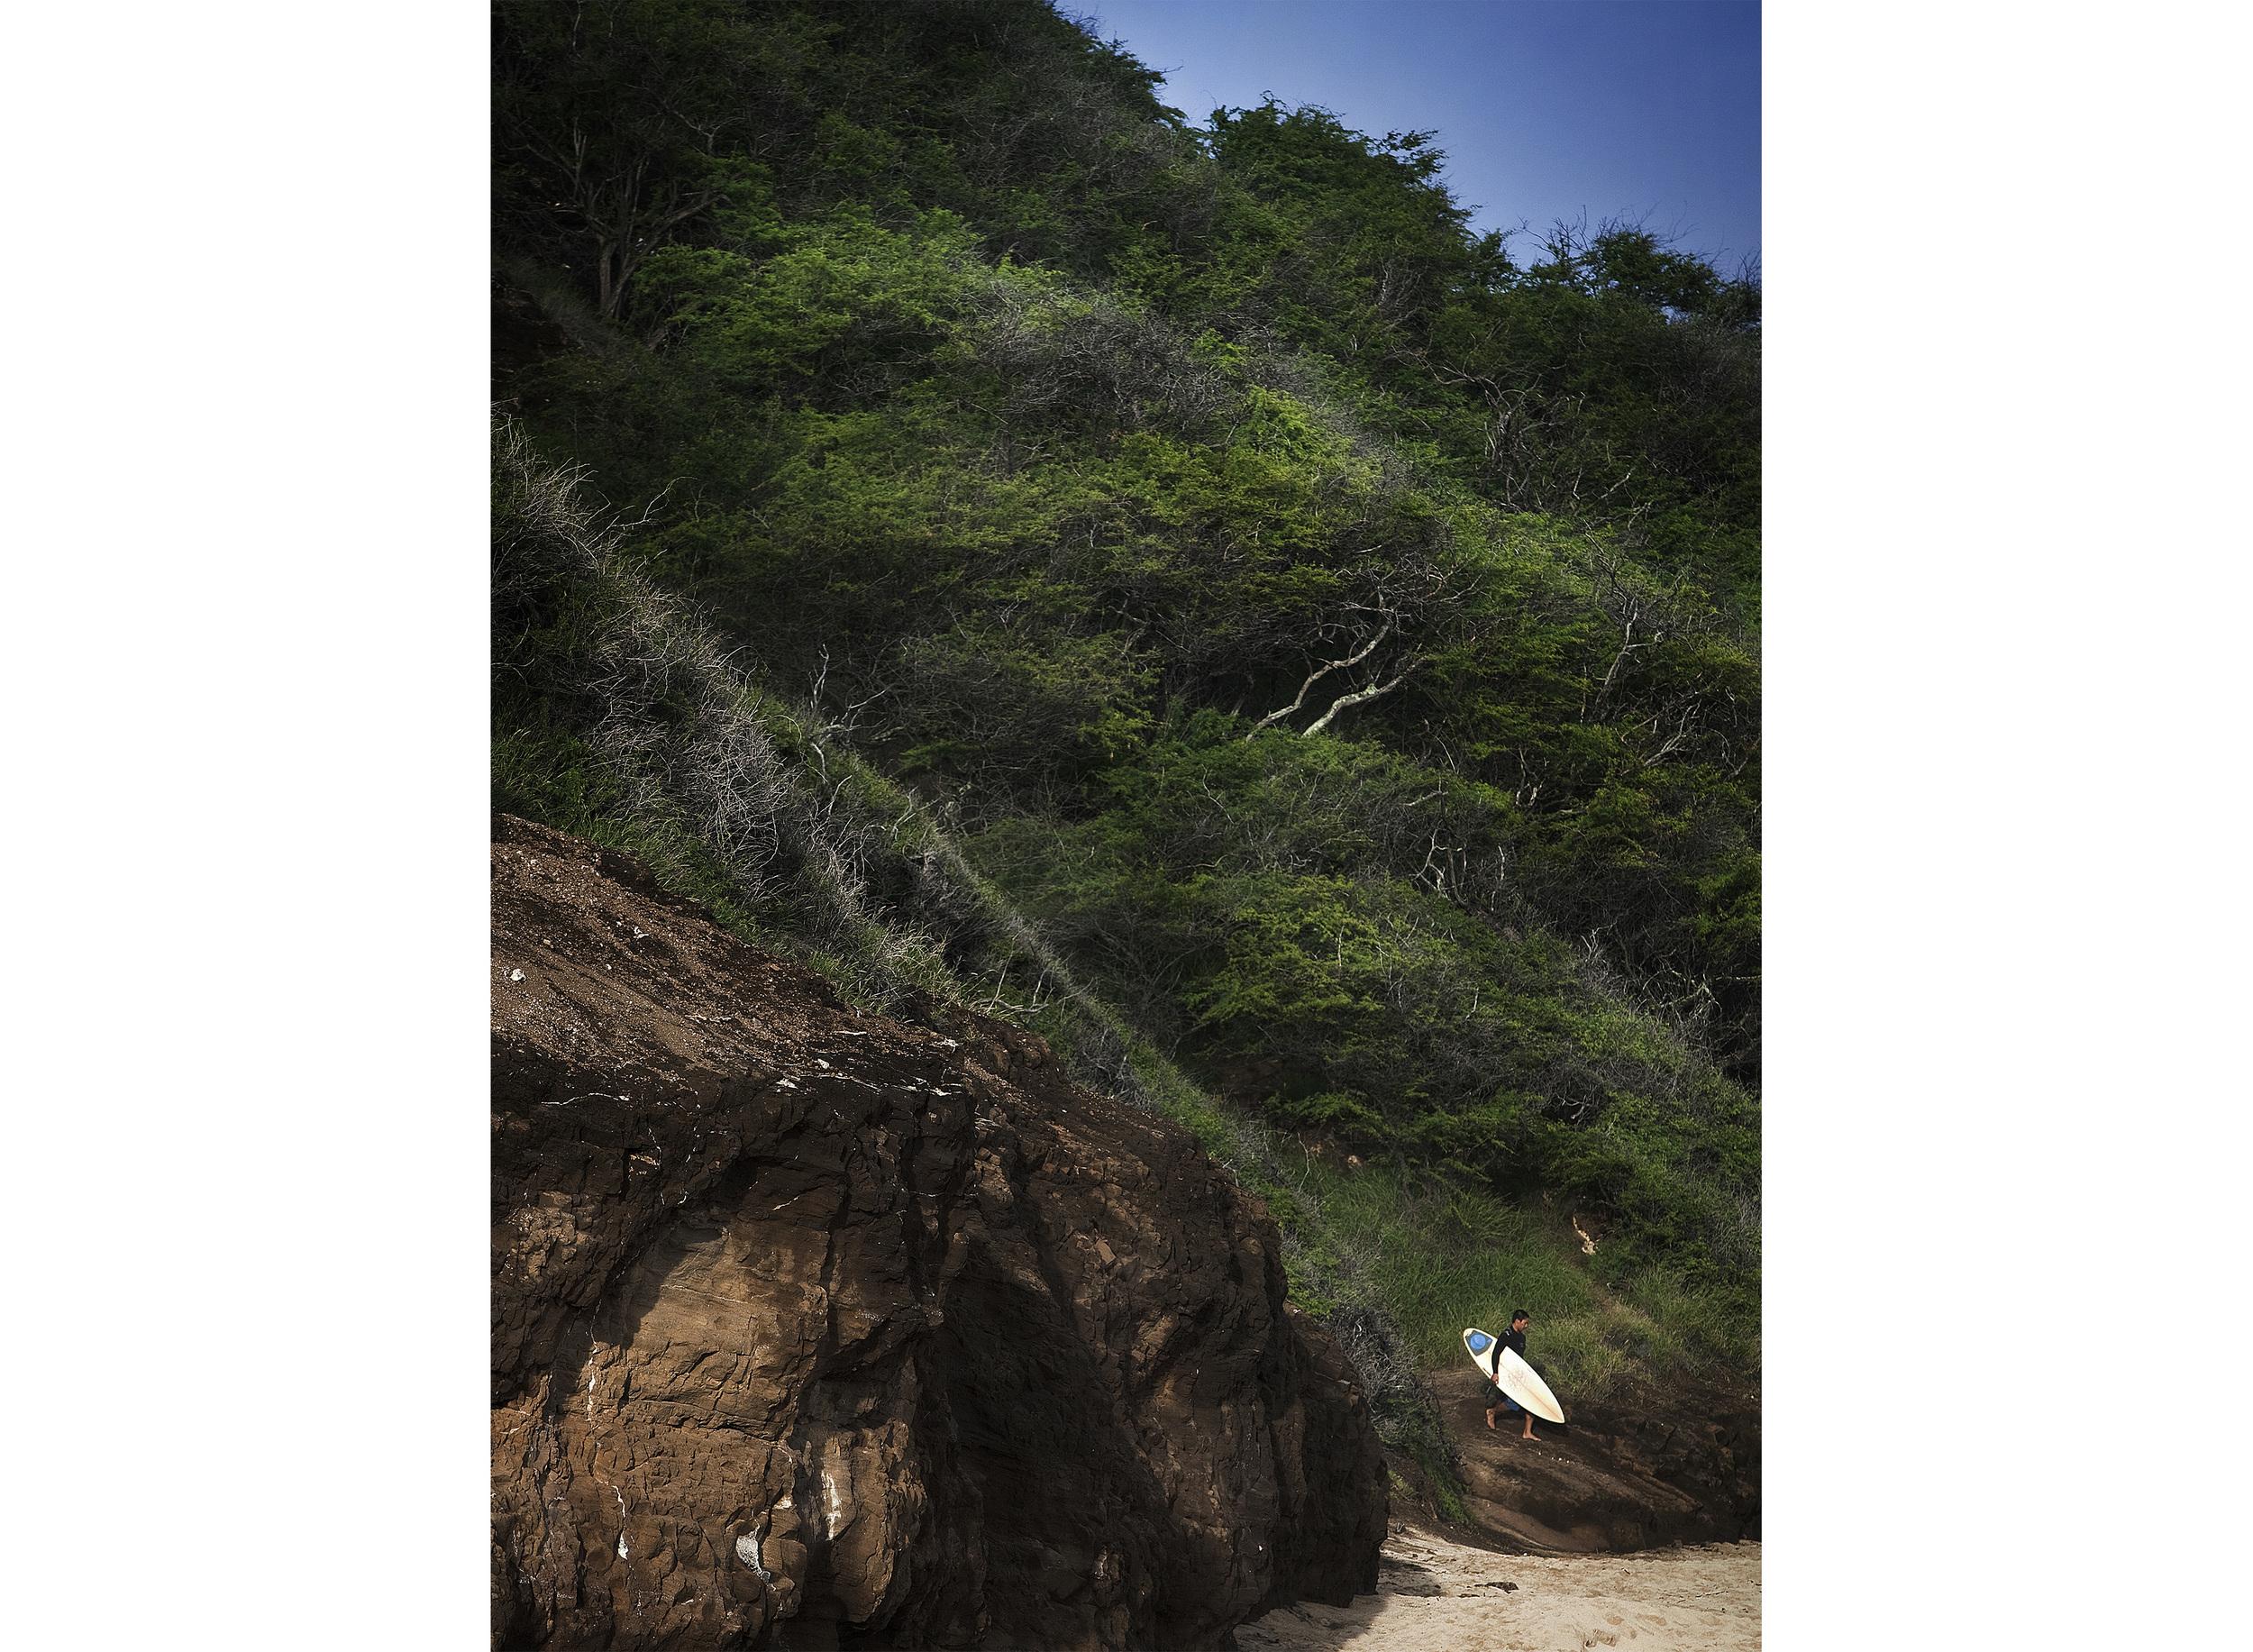 IMG_4914_surfers_cliff_update_web.jpg